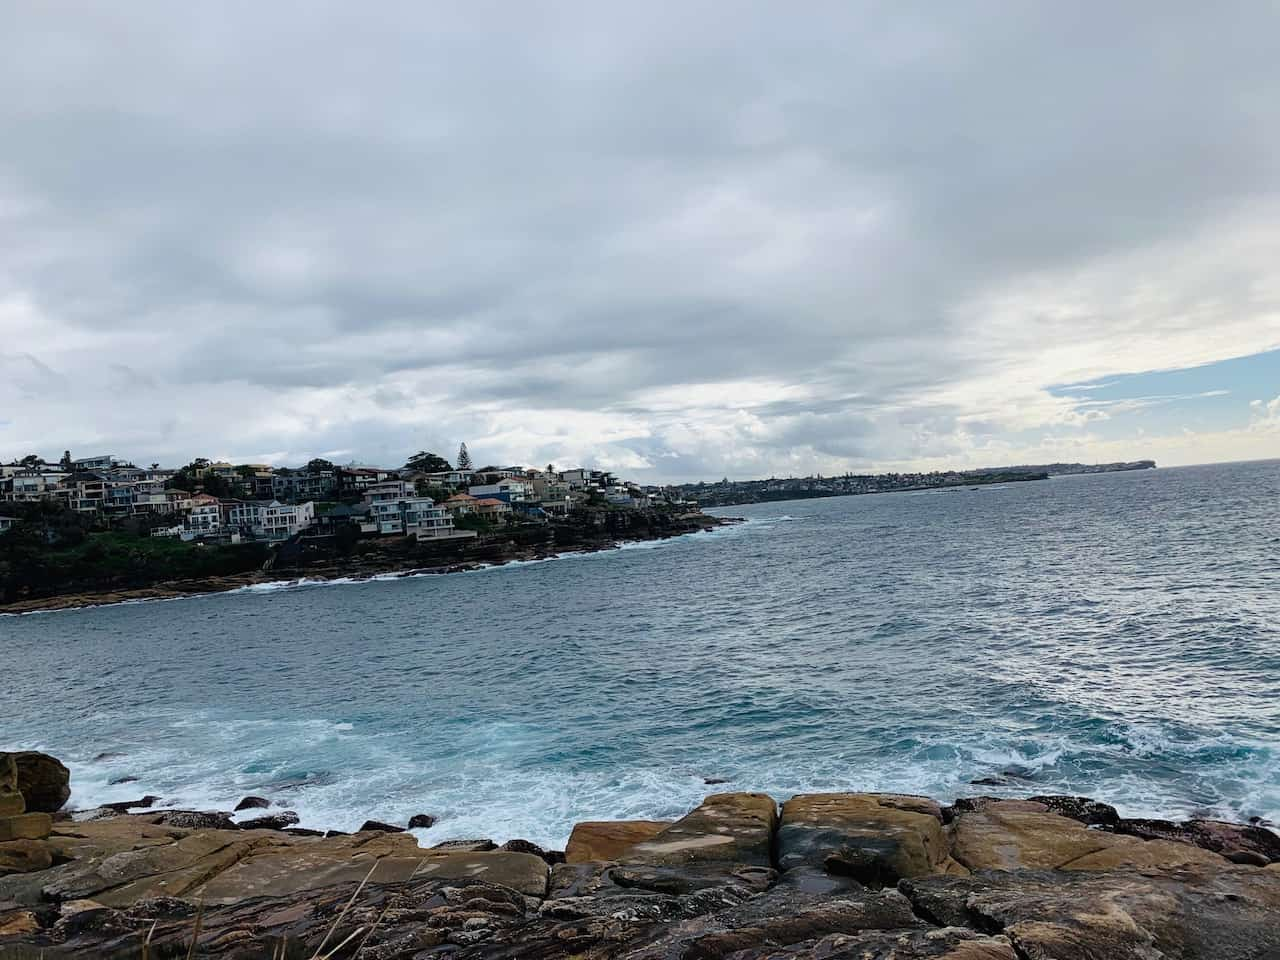 Maroubra Sydney